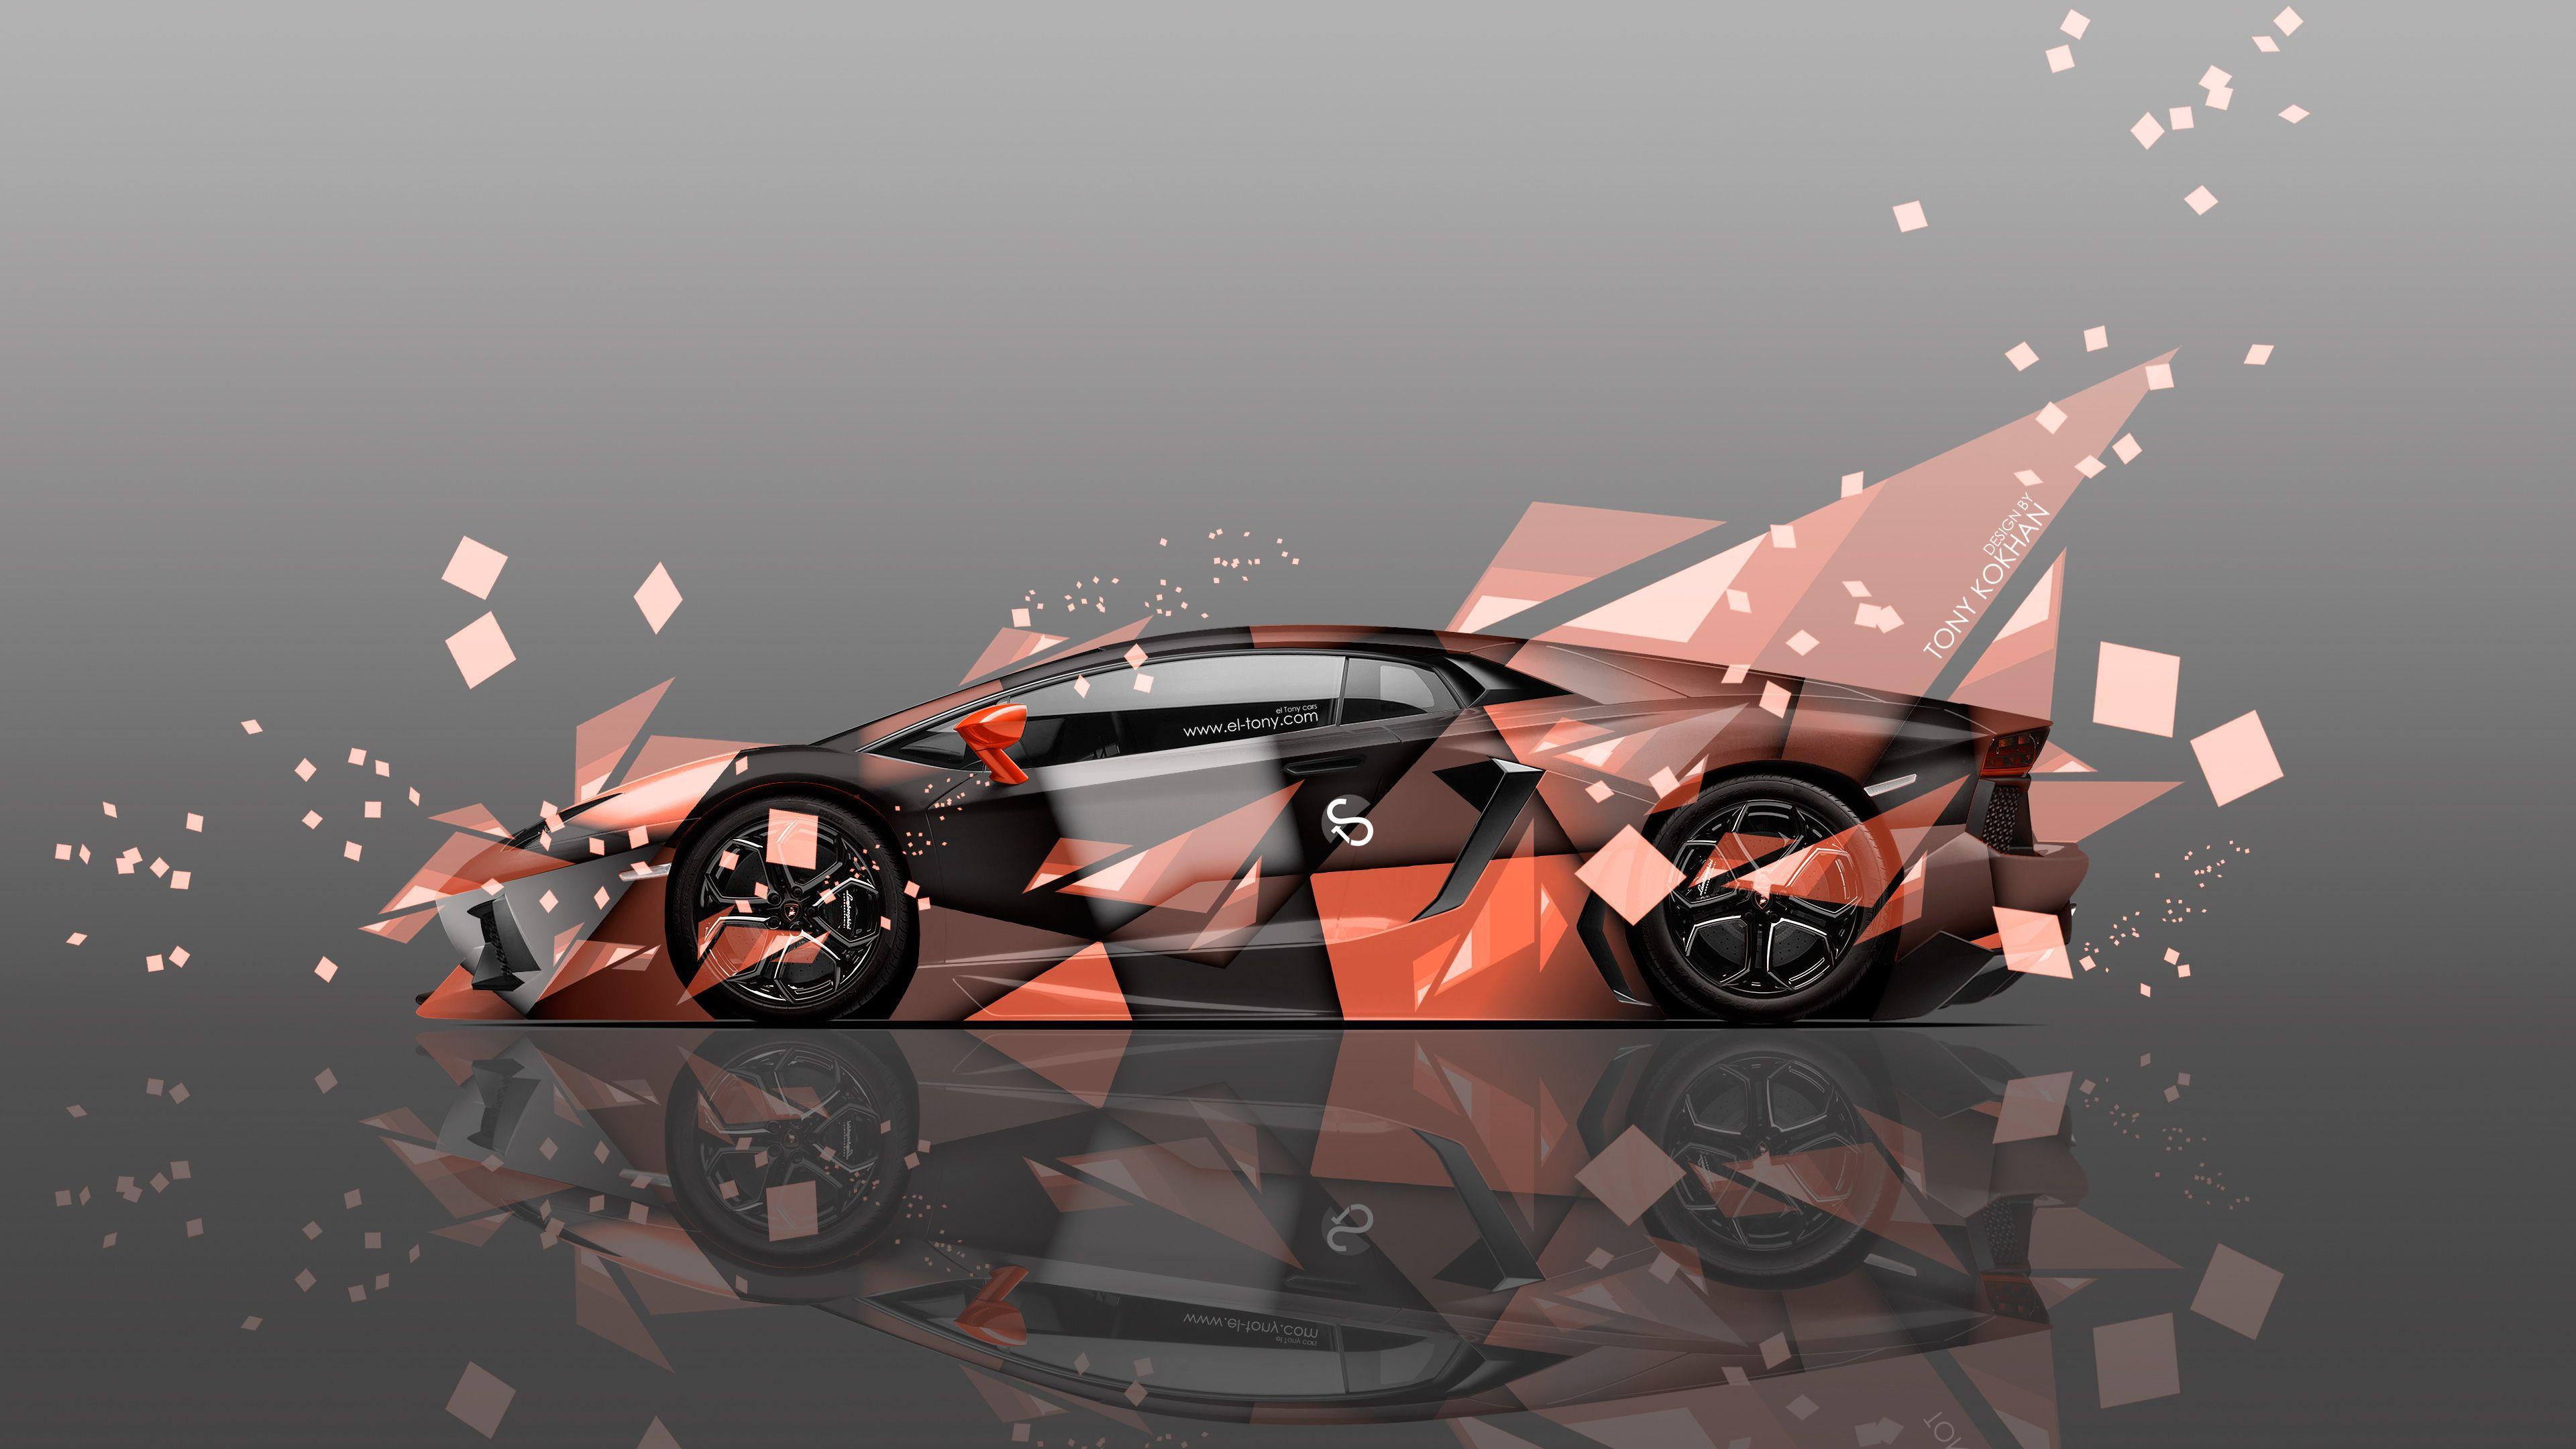 4k Laptop Car Wallpapers Top Free 4k Laptop Car Backgrounds Wallpaperaccess